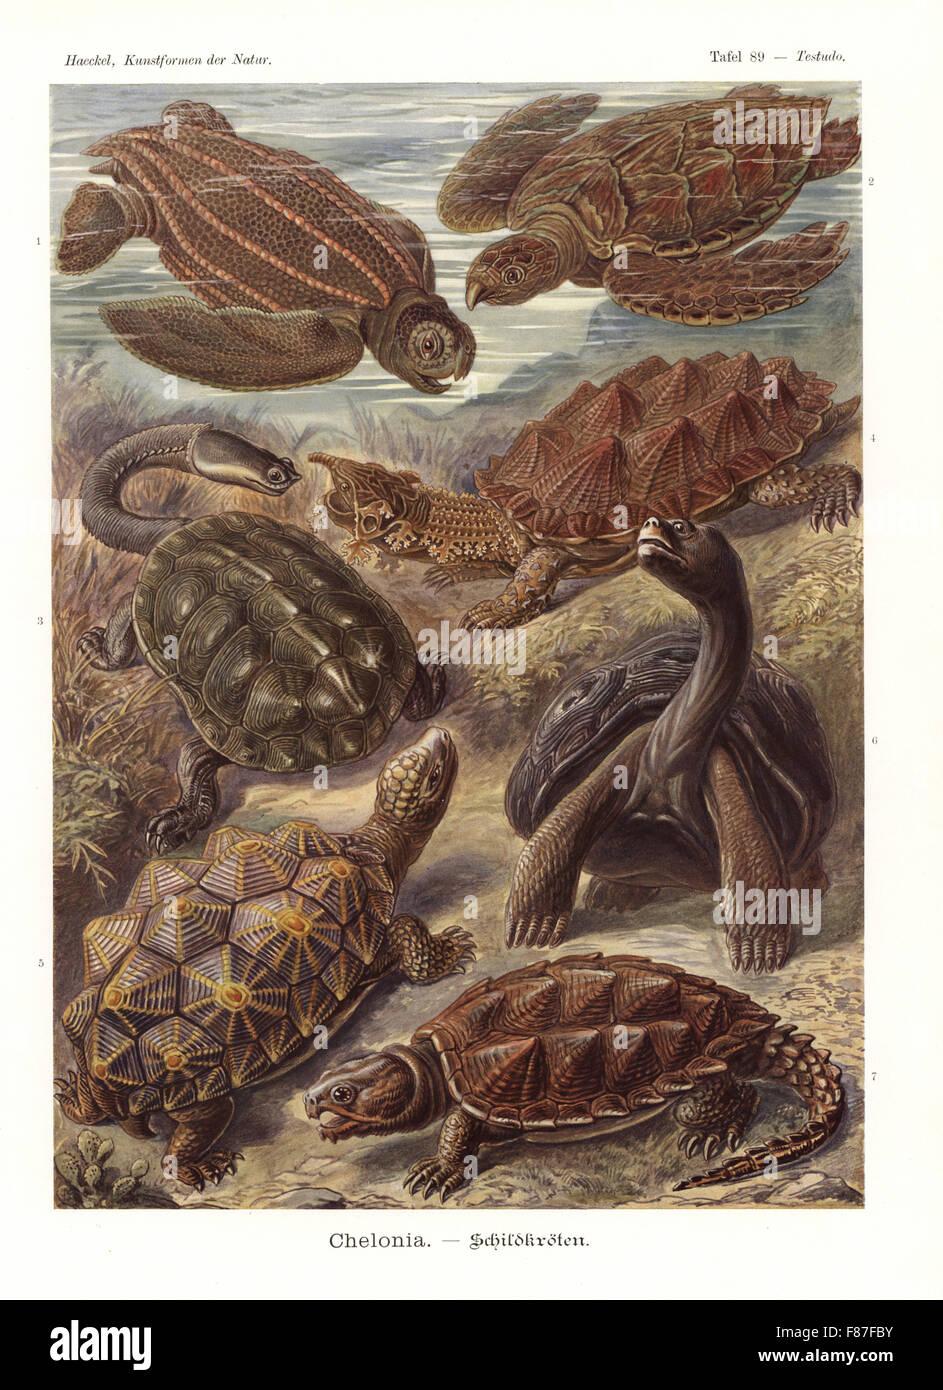 Chelonia: Leatherback turtle, Dermochelys coriacea, hawksbill turtle, Eretmochelys imbricata (critically endangered), - Stock Image